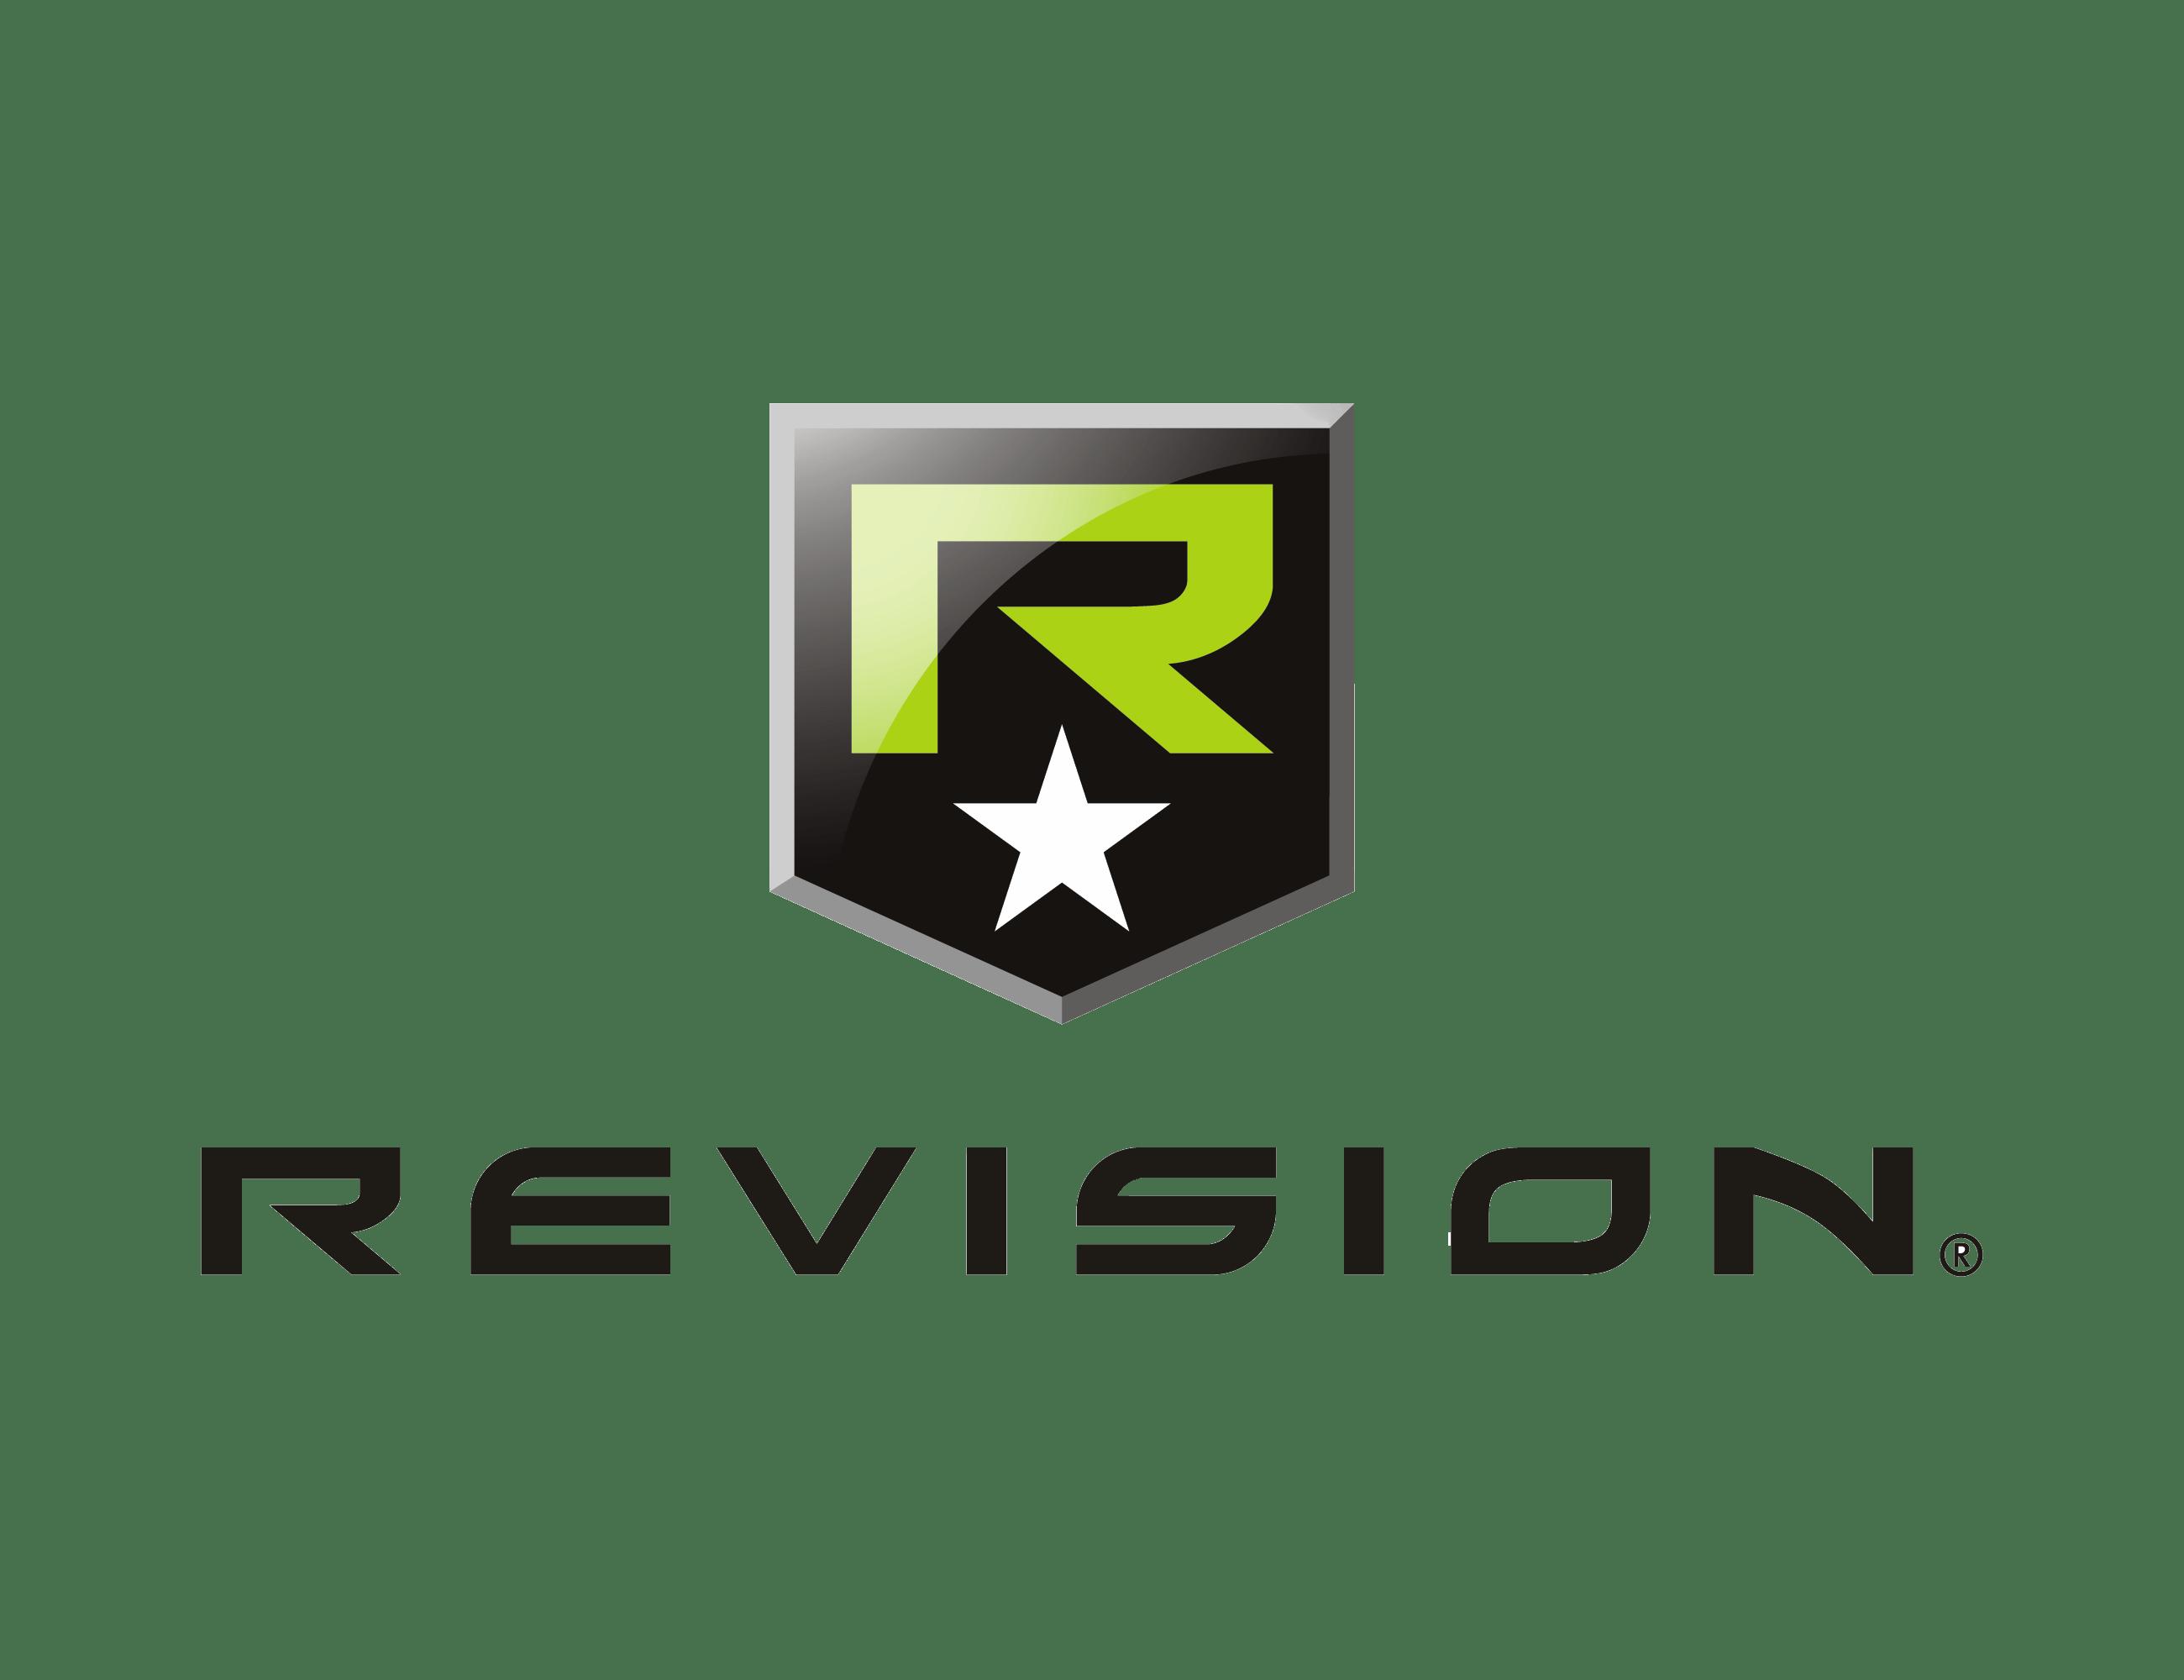 Image result for Revision logo